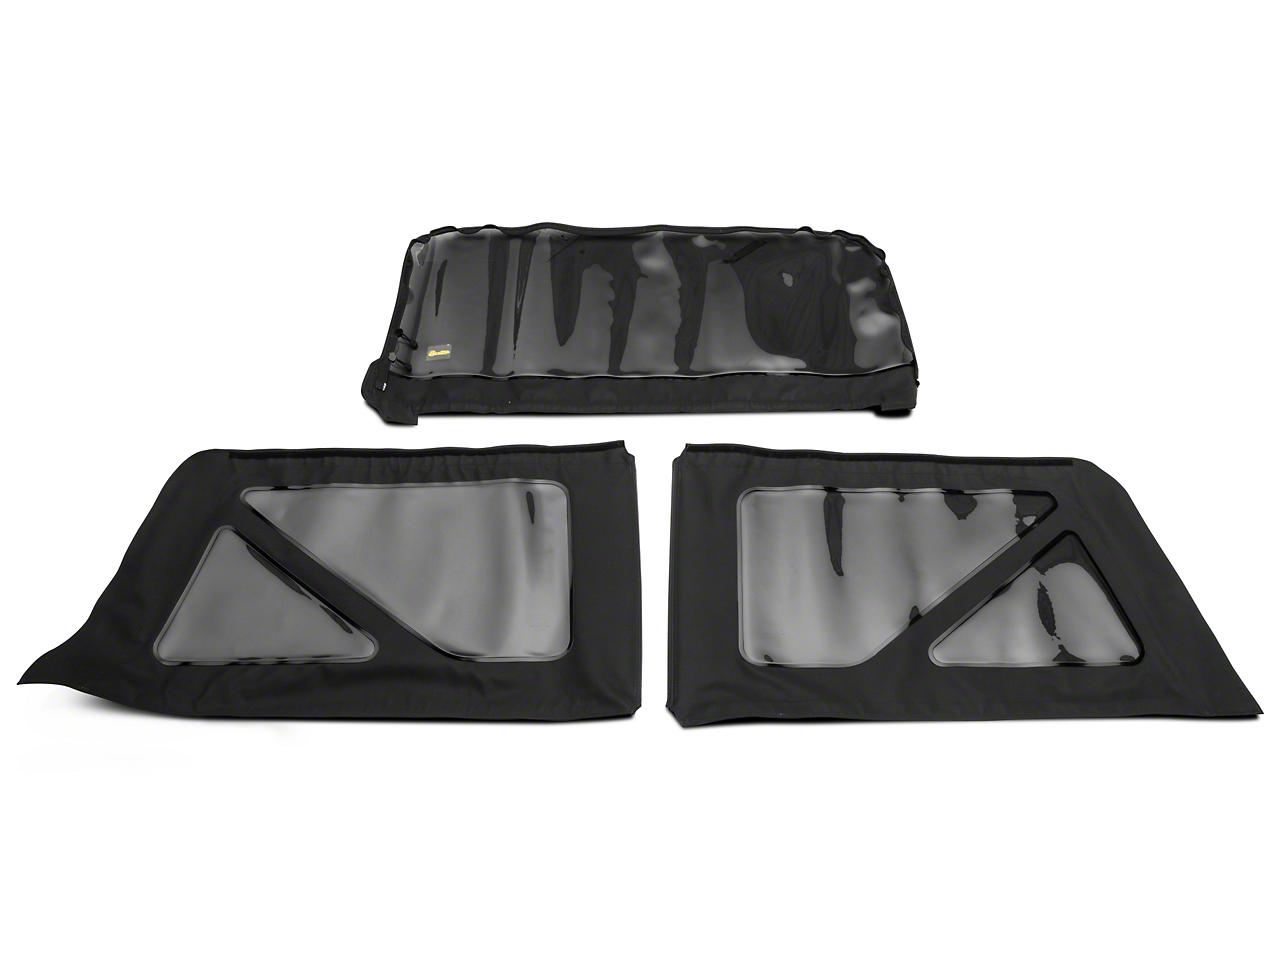 Bestop Tinted Replacement Window Set for Sailcloth Replace-a-Top/SuperNX/Factory Soft Tops - Black Diamond (11-18 Jeep Wrangler JK 2 Door)